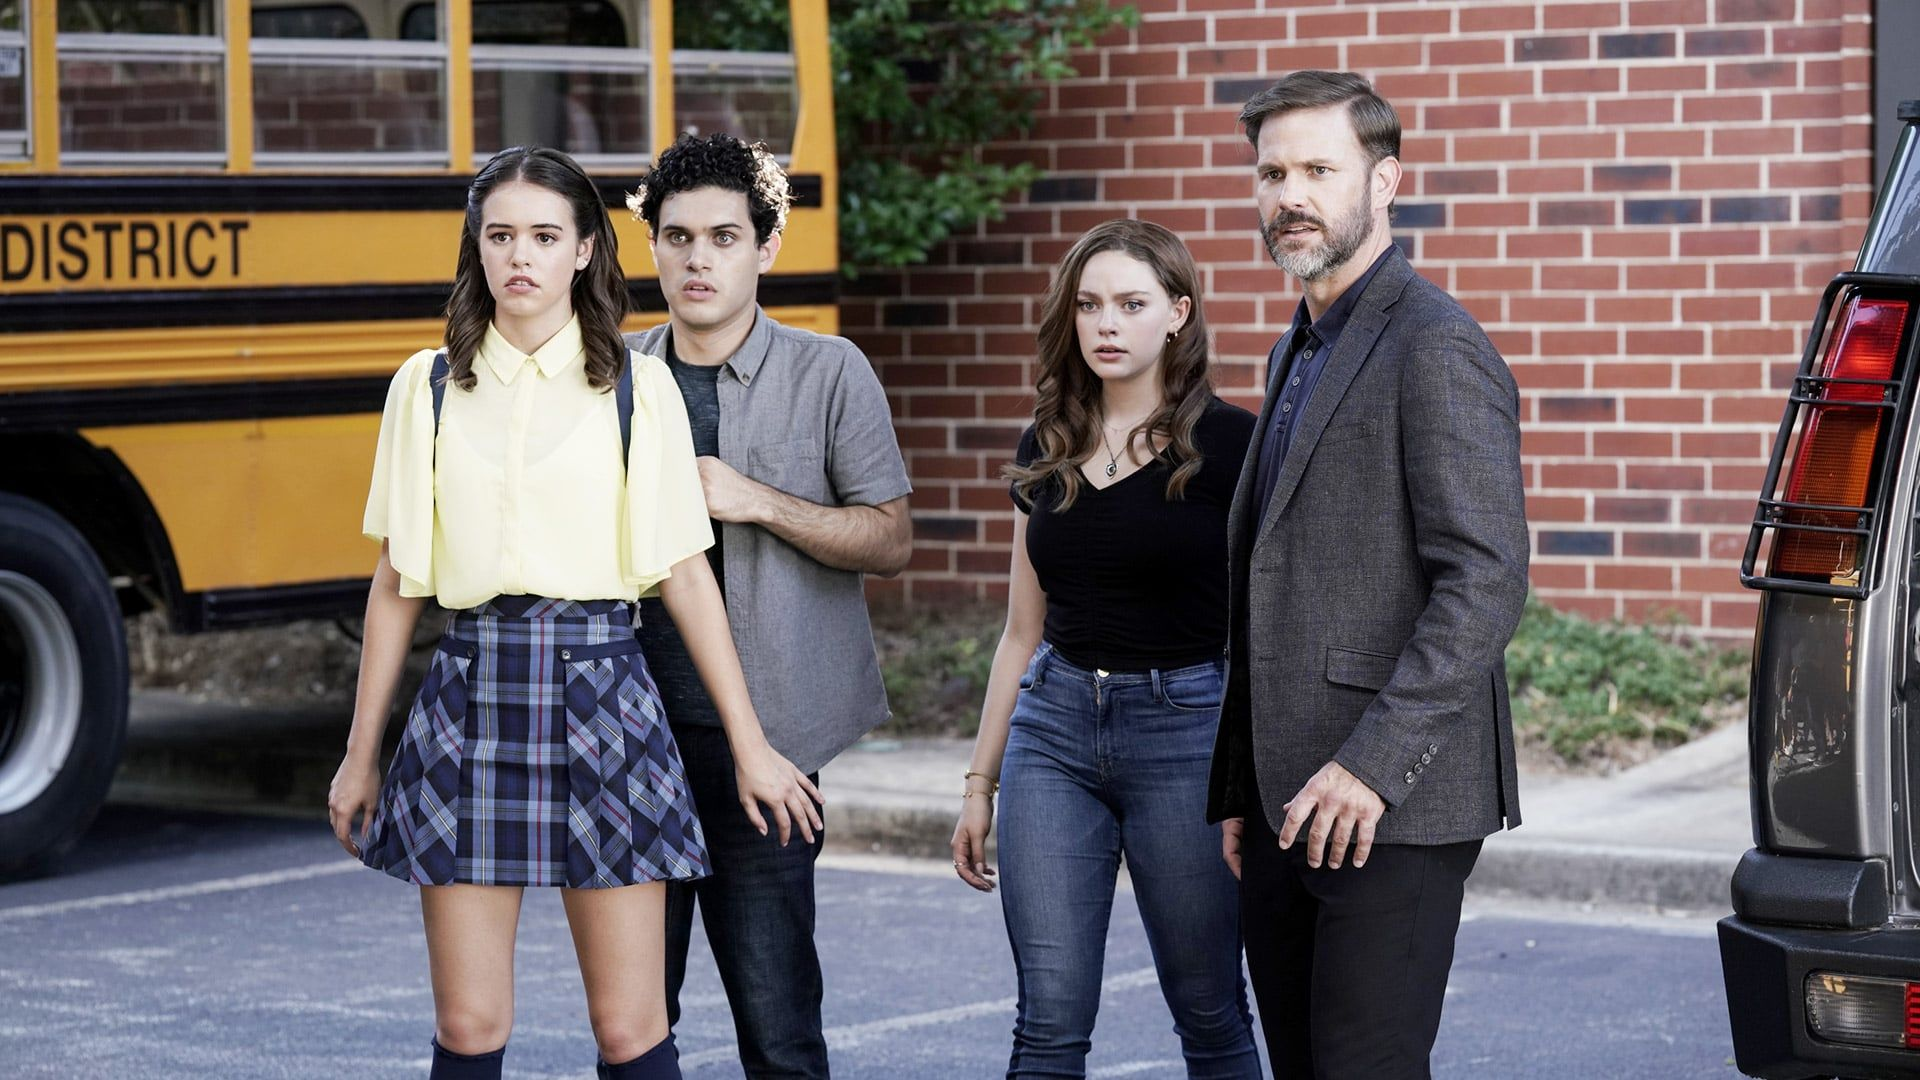 Assistir Legacies 2ª Temporada Episodio 05 Online Filmes Online